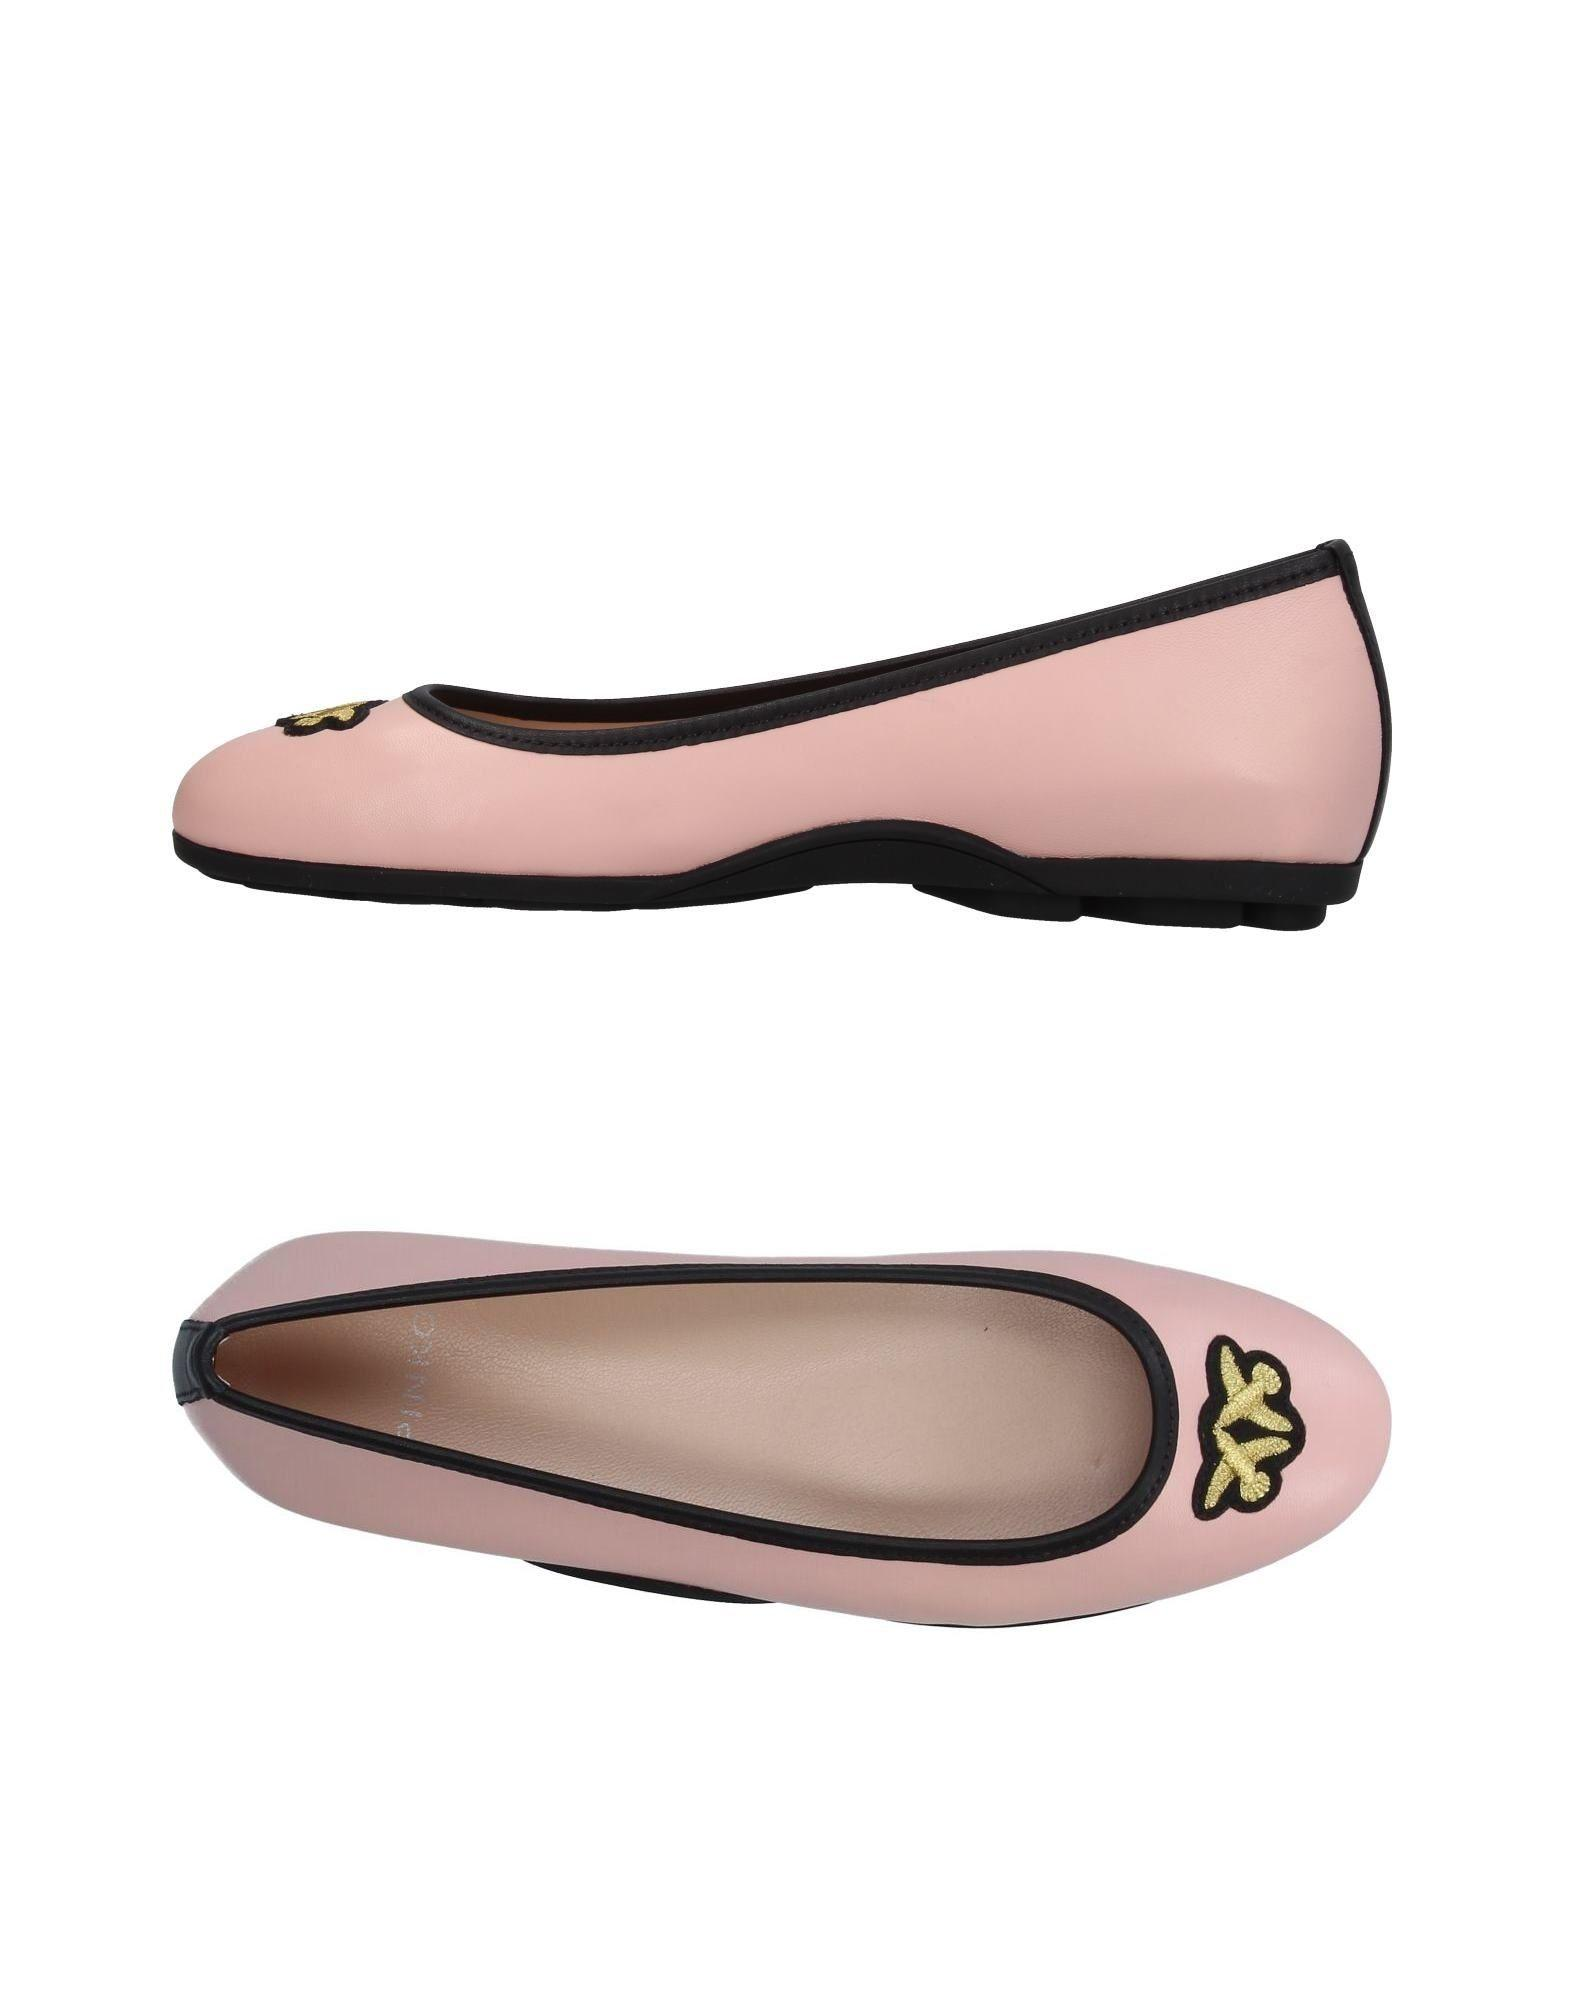 Pinko Ballet Flats In Light Pink